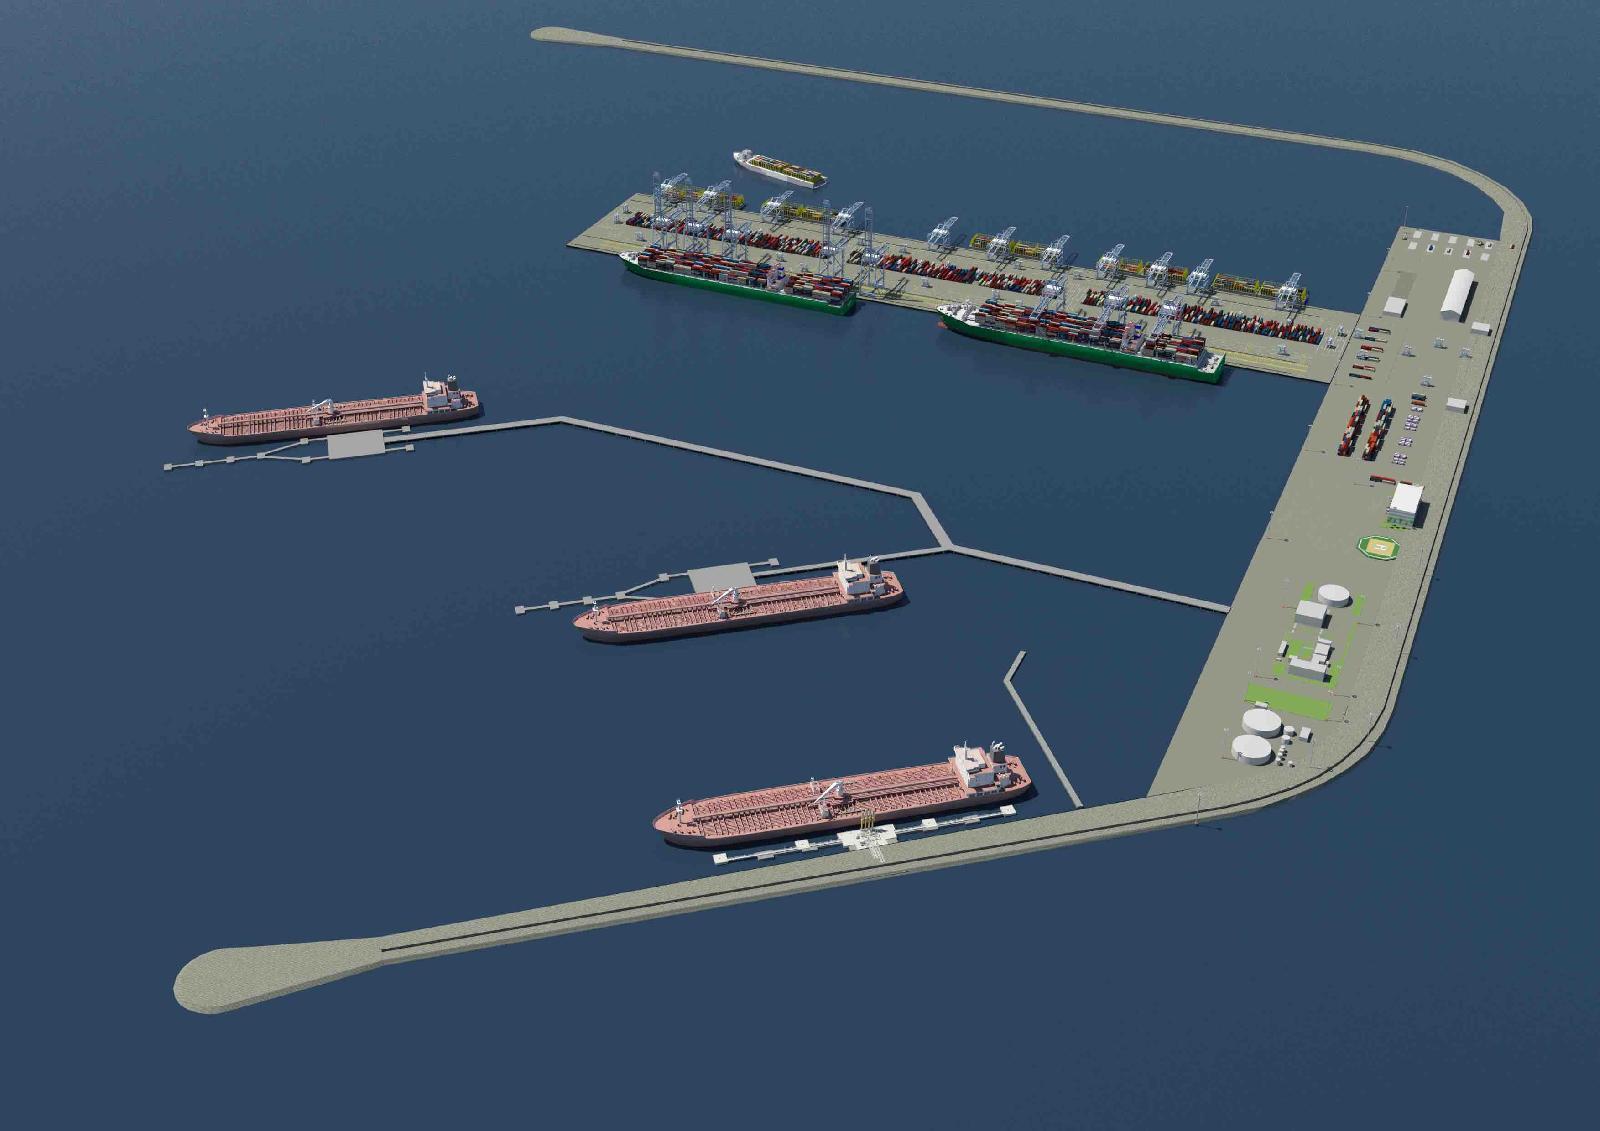 Royal HaskoningDHV master plan for Port of Venice extension presented